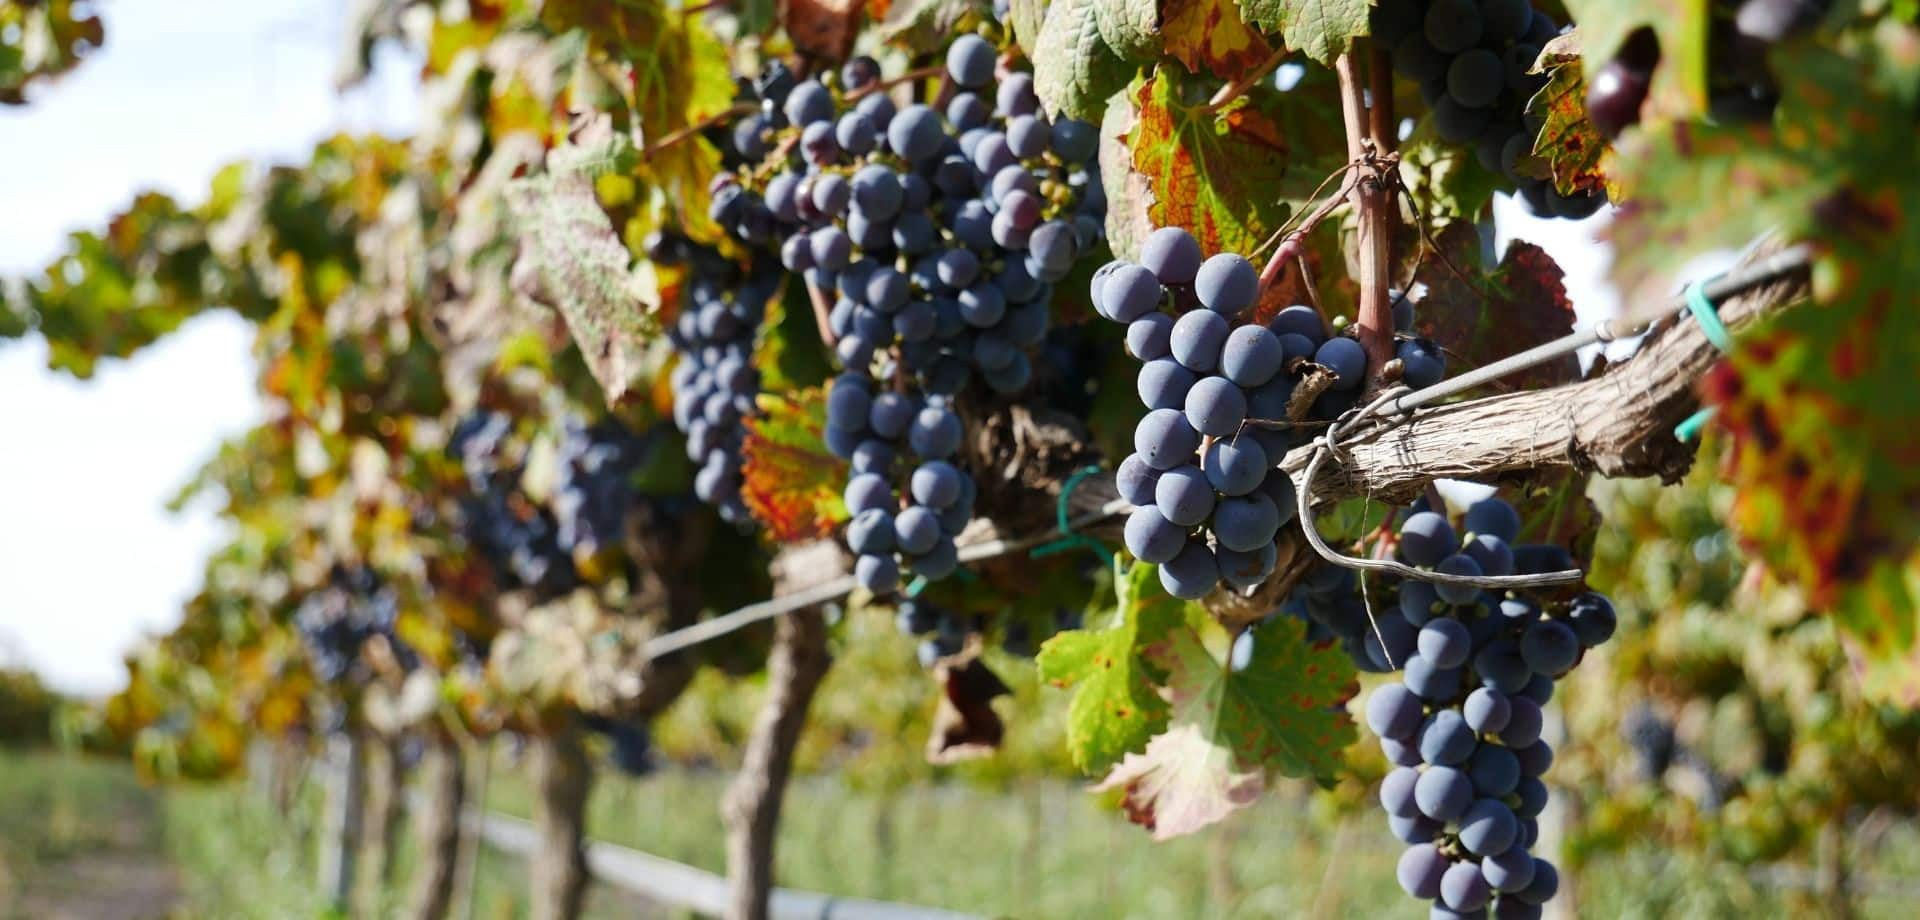 Gusta vini biologici siciliani a Marzamemi